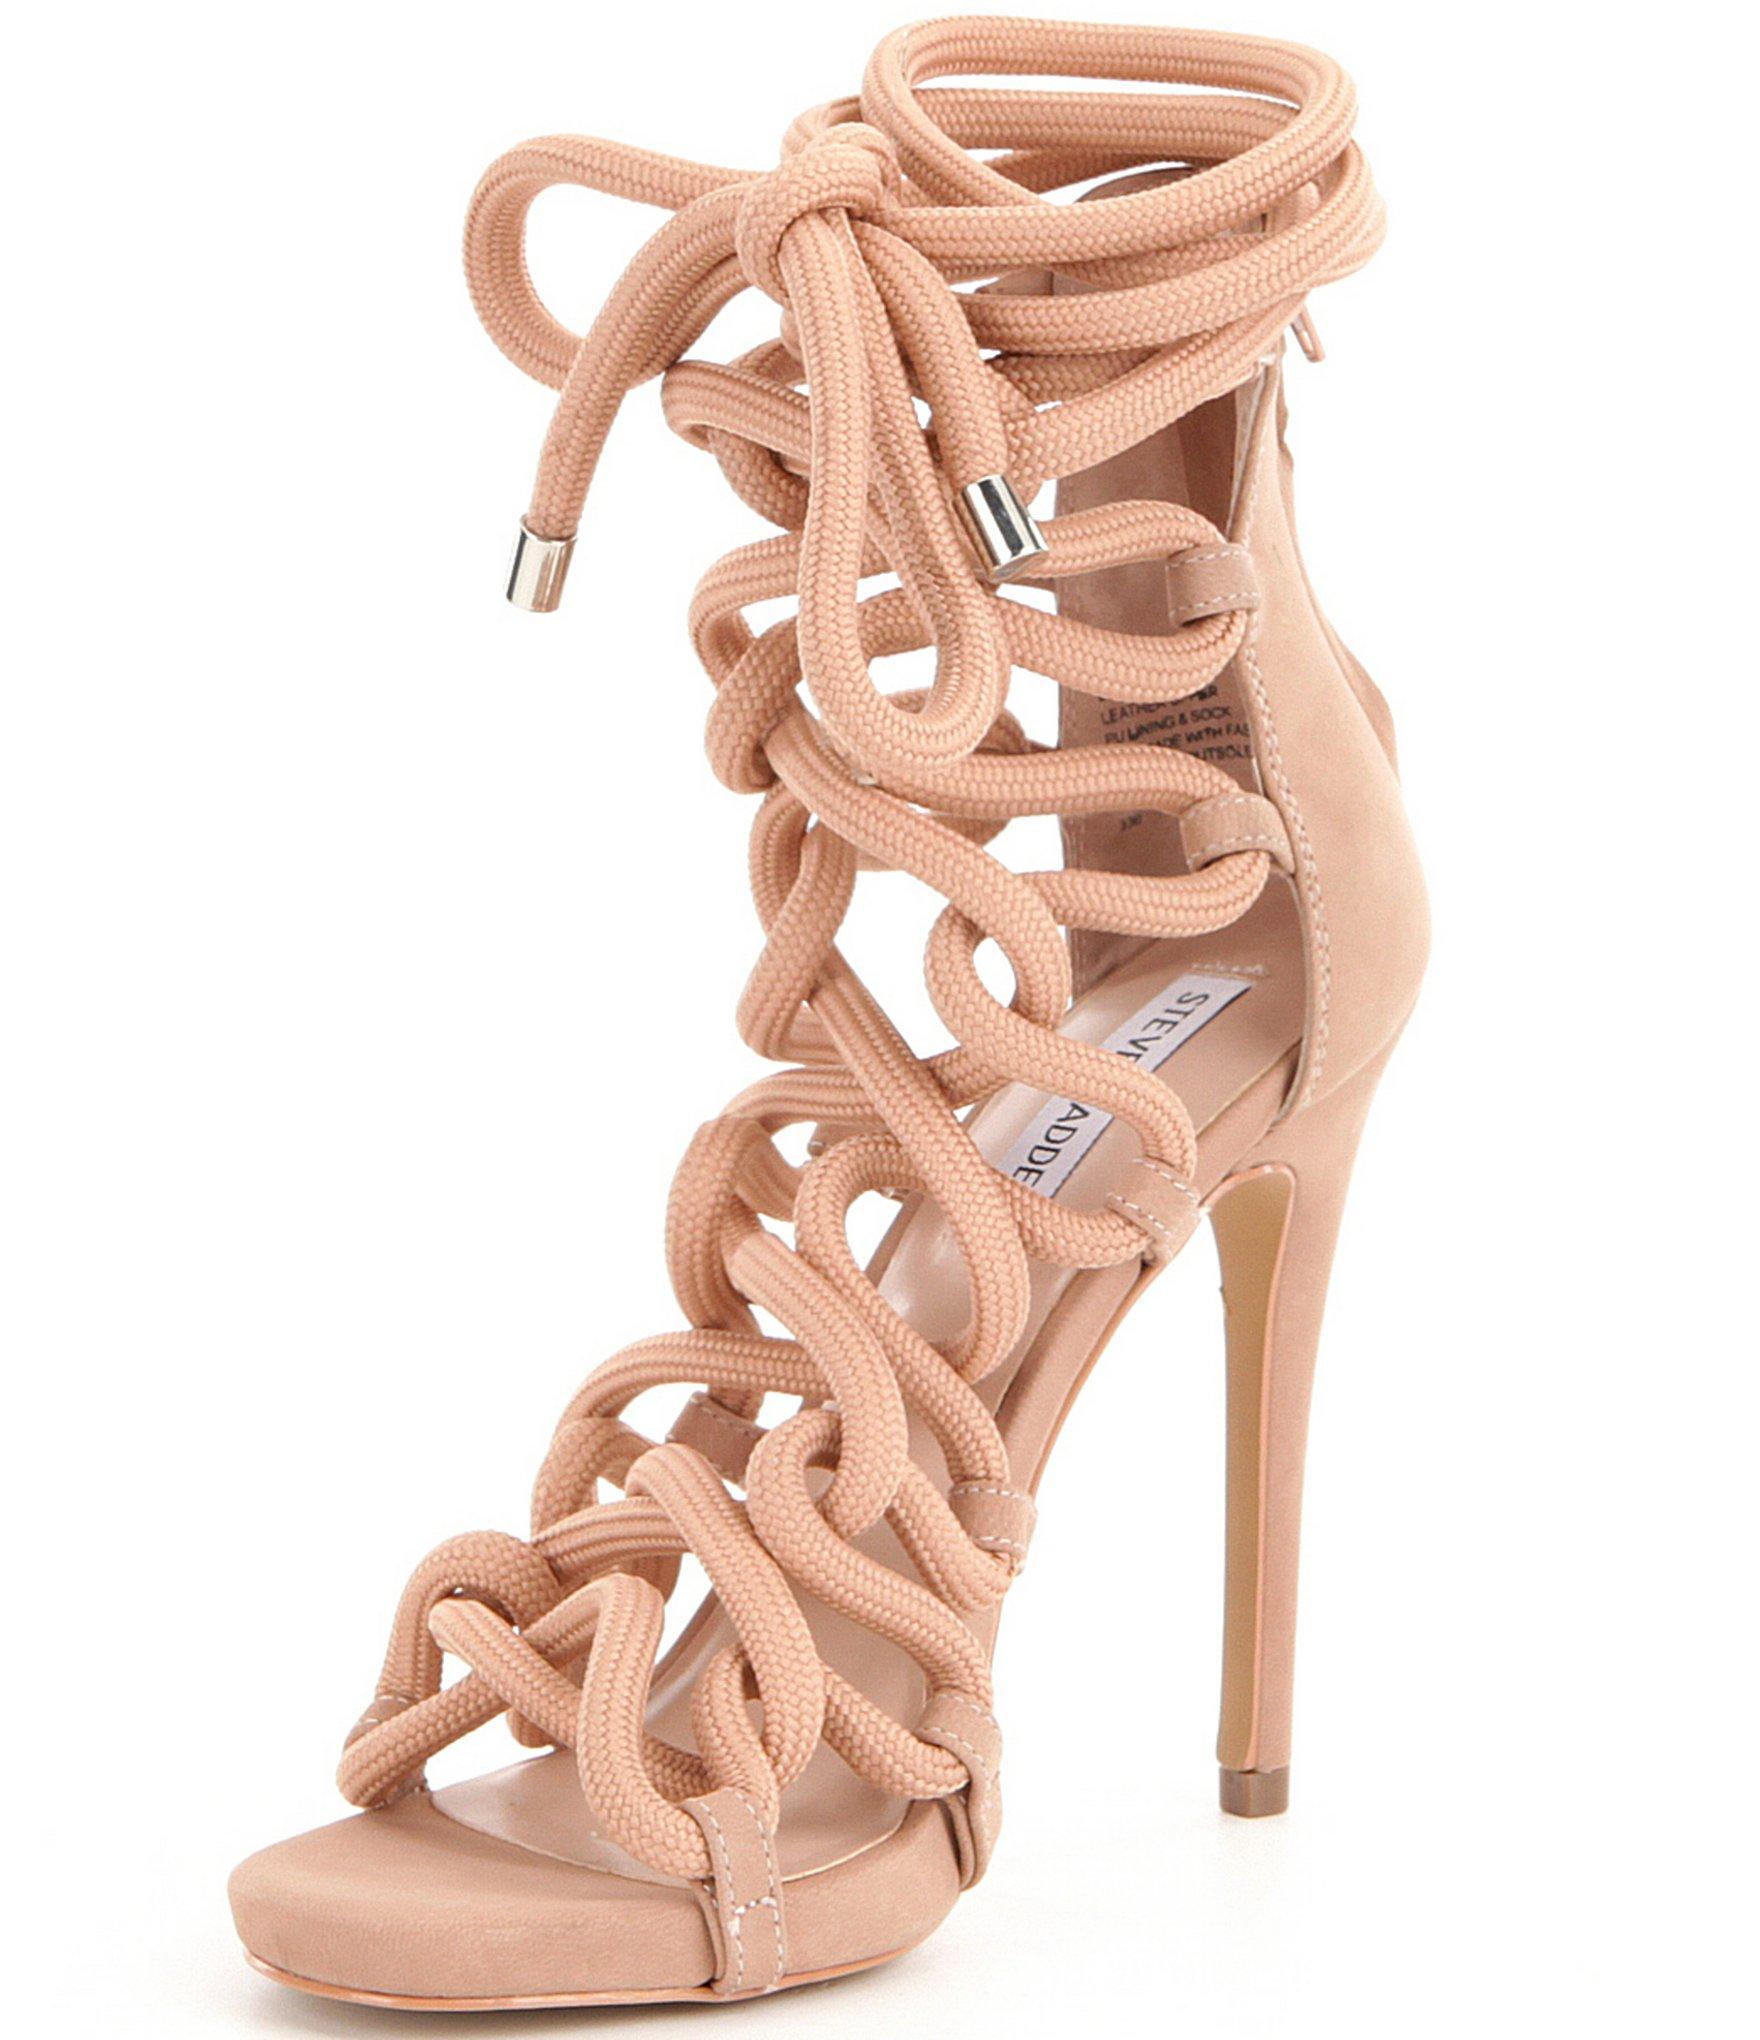 2c847e351dd Lyst steve madden dancin back zip bungee inspired lace up high jpg  1760x2040 Rope heels steve